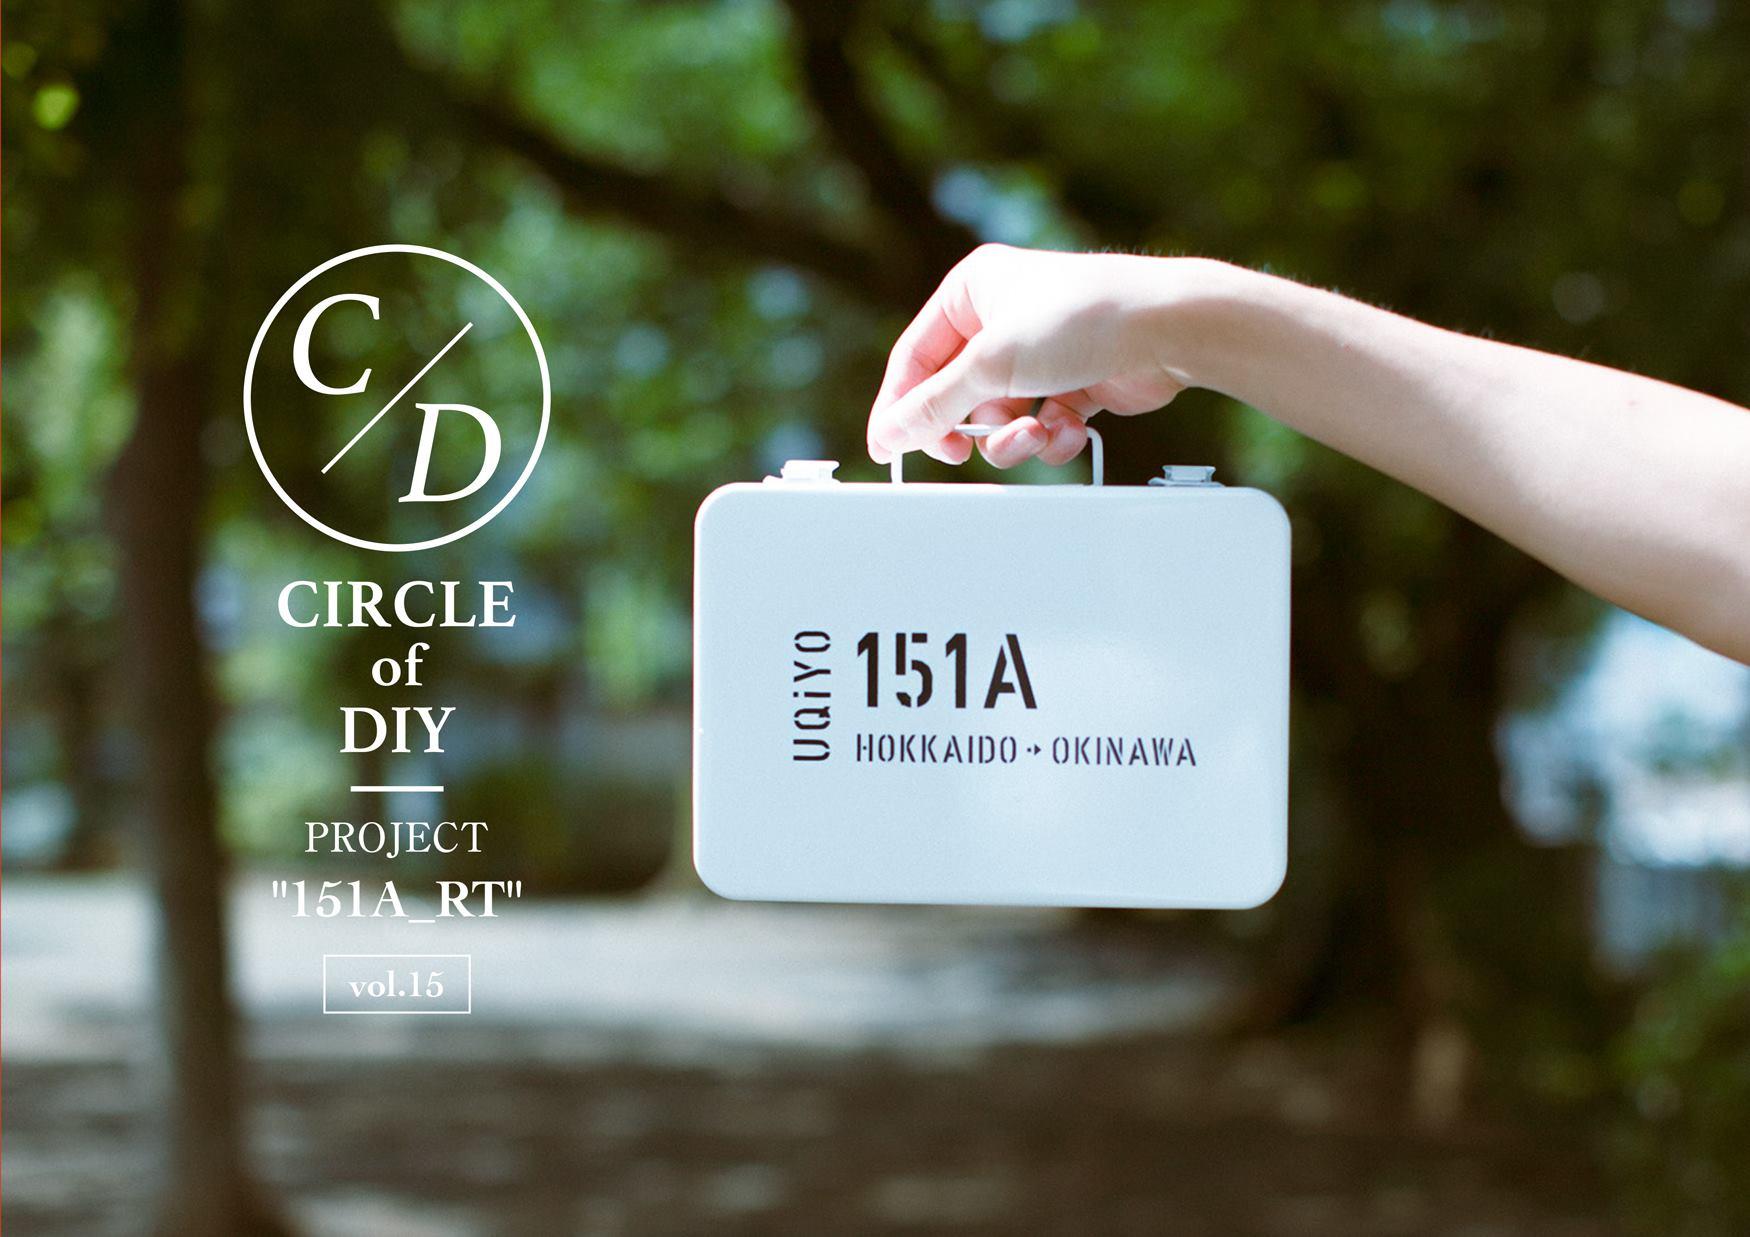 UQiYO、151A_RTプロジェクト:旅するCDがクリエイターを繋ぐ/CIRCLE of DIY Vol.15